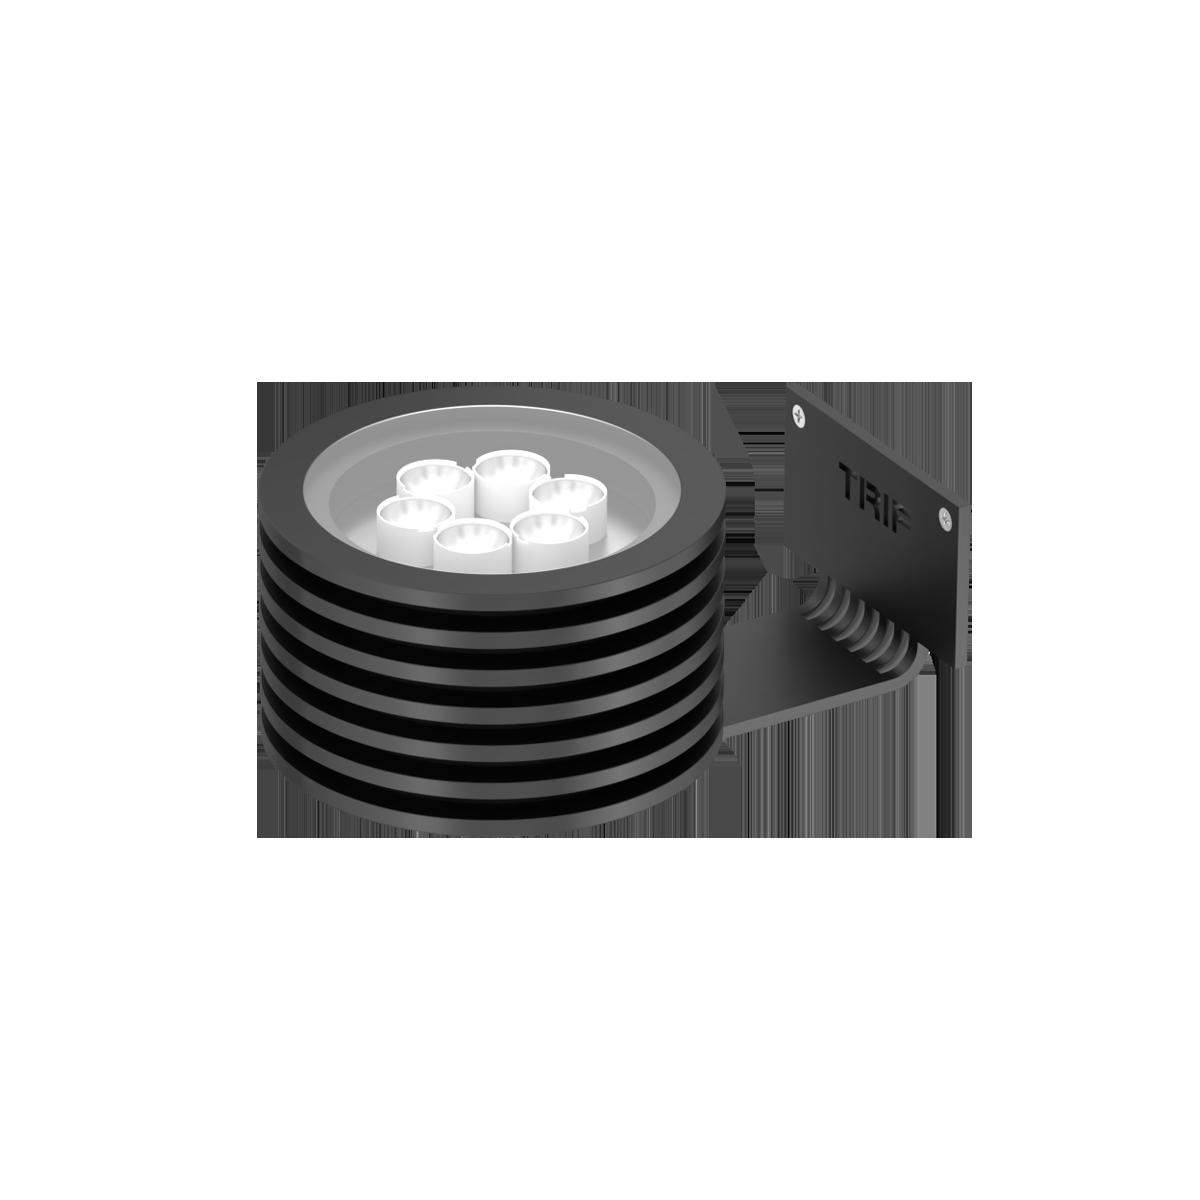 Светильник TRIF JUPITER WALL от производителя